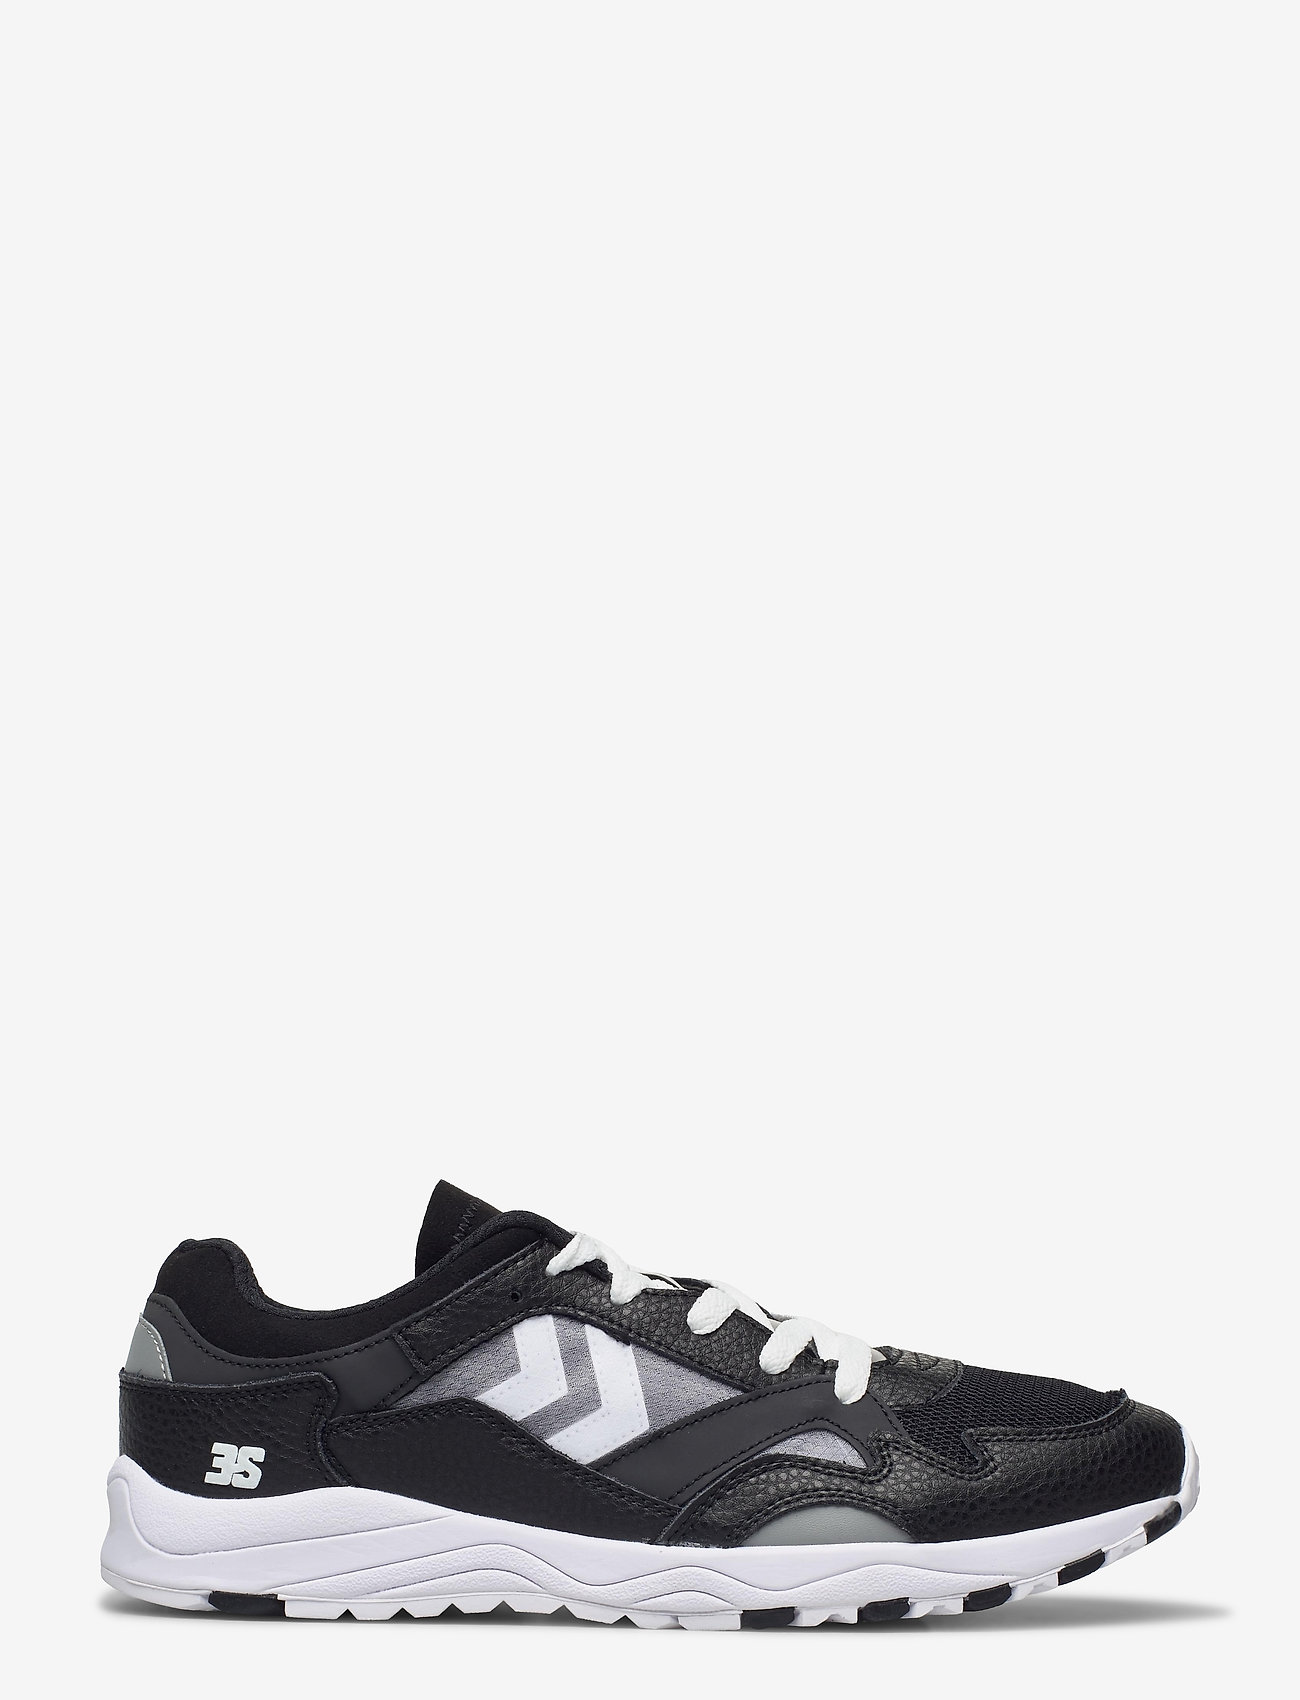 Hummel - EDMONTON 3S LEATHER - laag sneakers - black - 0